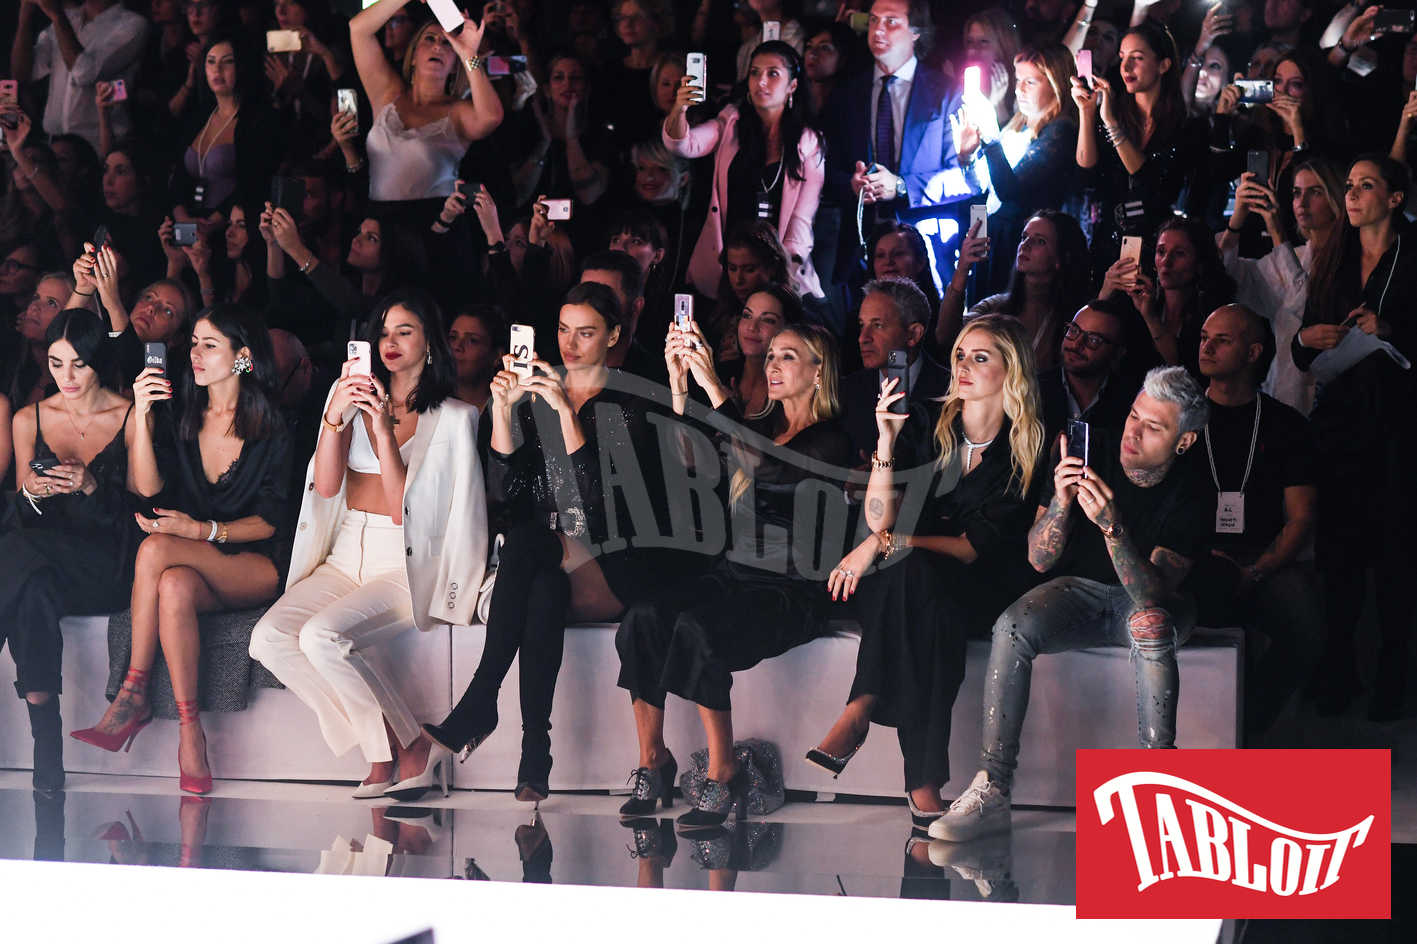 Chiara Biasi, Gilda Ambrosio, Bruna Marquezine, Irina Shayk, Sarah Jessica Parker, Chiara Ferragni e Fedez nel front row durante la sfilata di Intimissimi